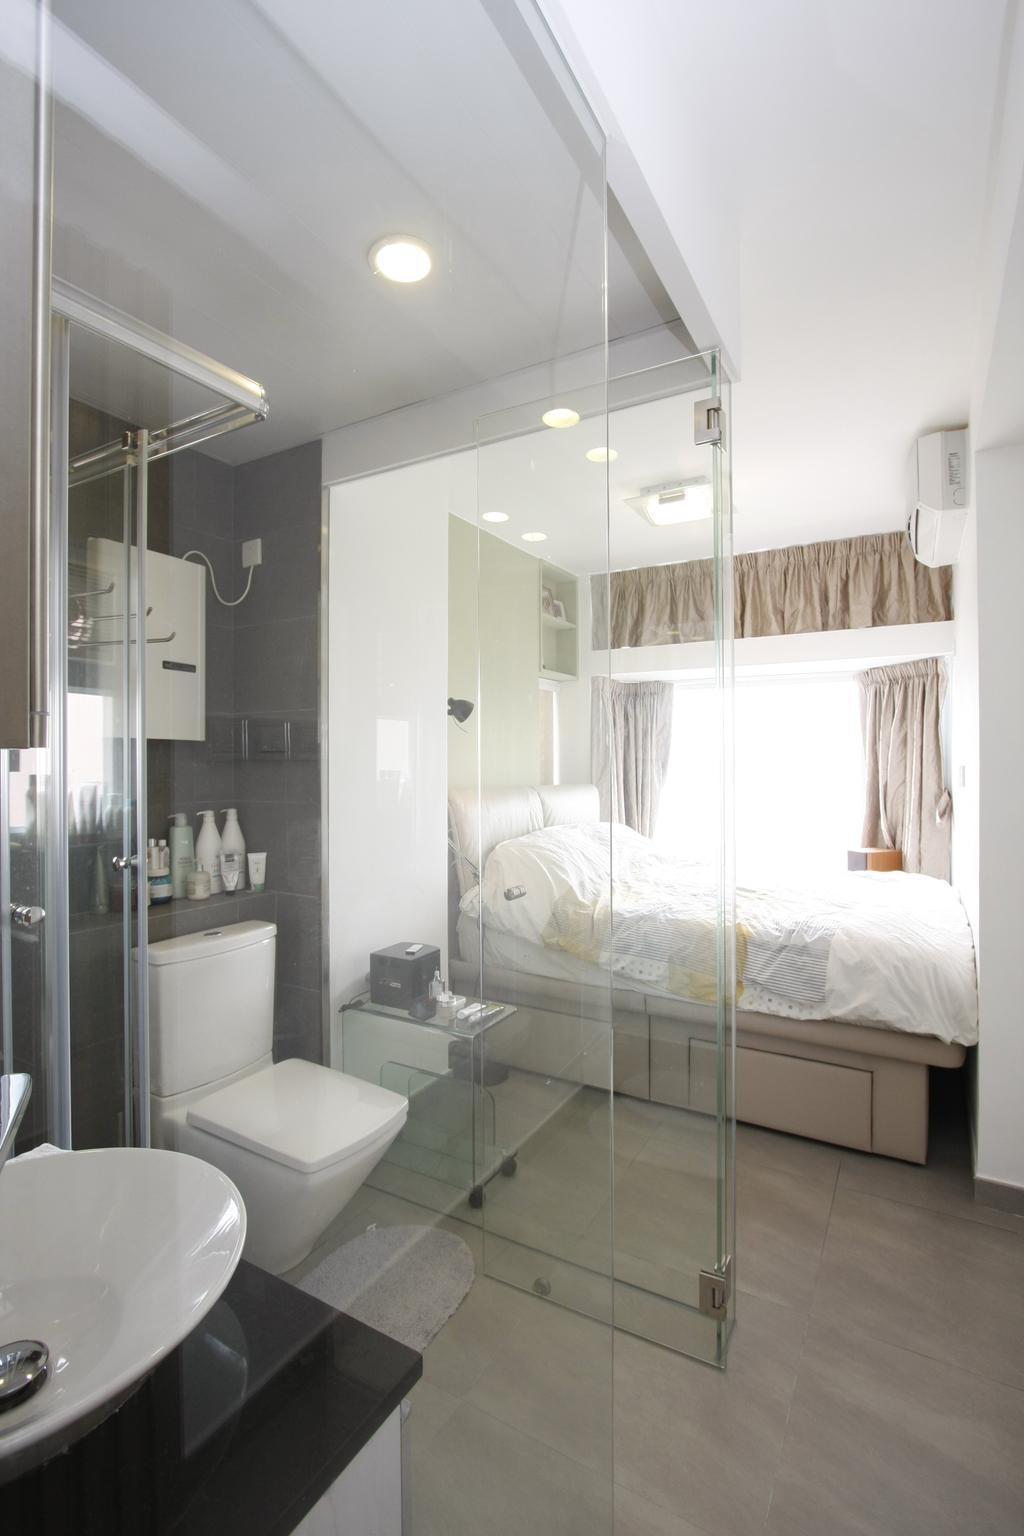 摩登, 私家樓, 浴室, 黃金海岸, 室內設計師, 和生設計, 睡房, Indoors, Interior Design, Room